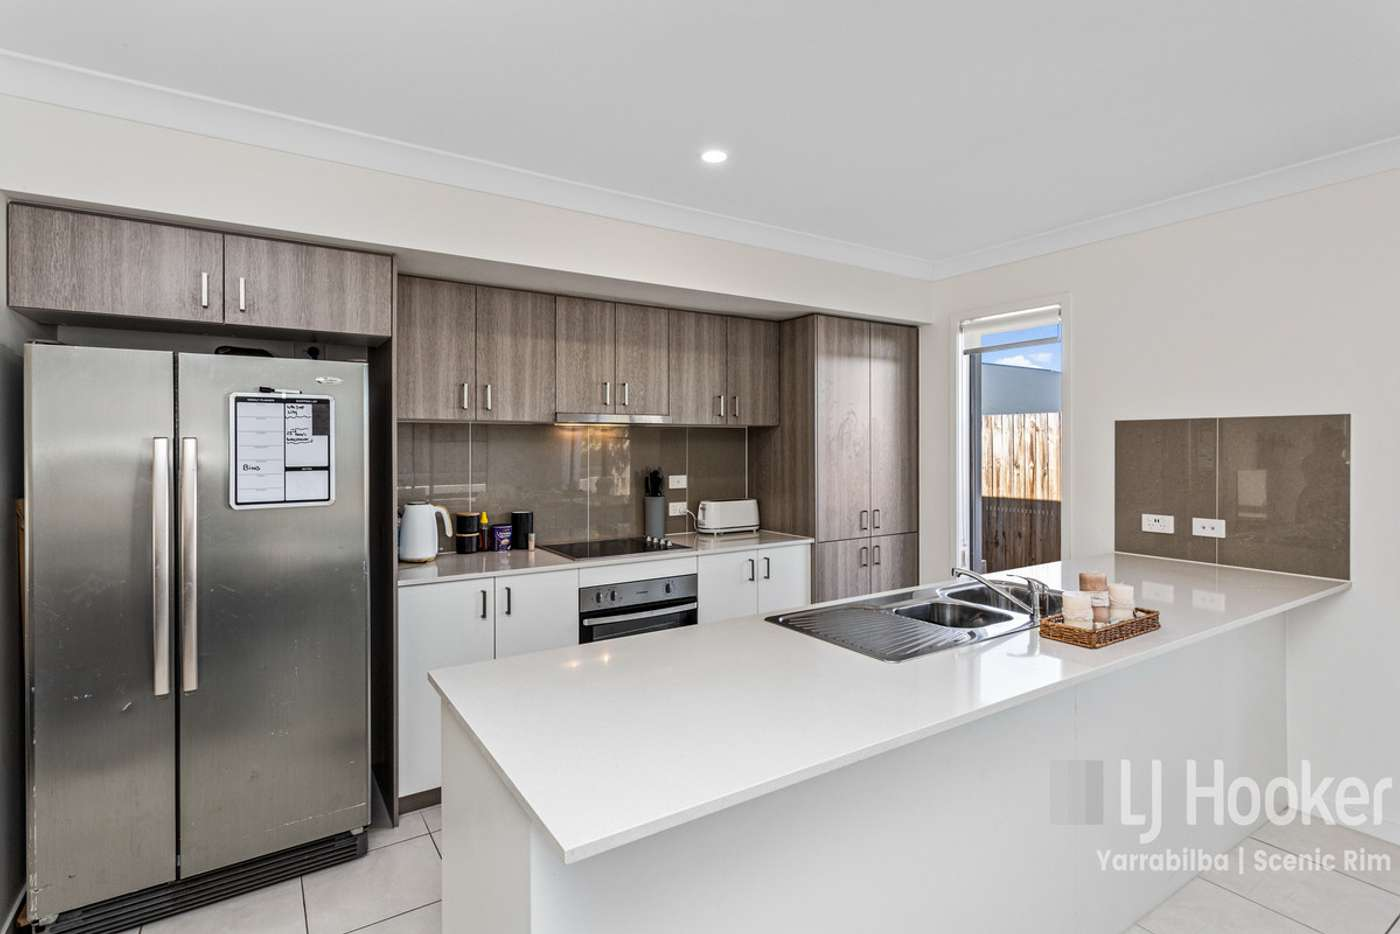 Main view of Homely house listing, 4 Flint Street, Yarrabilba QLD 4207